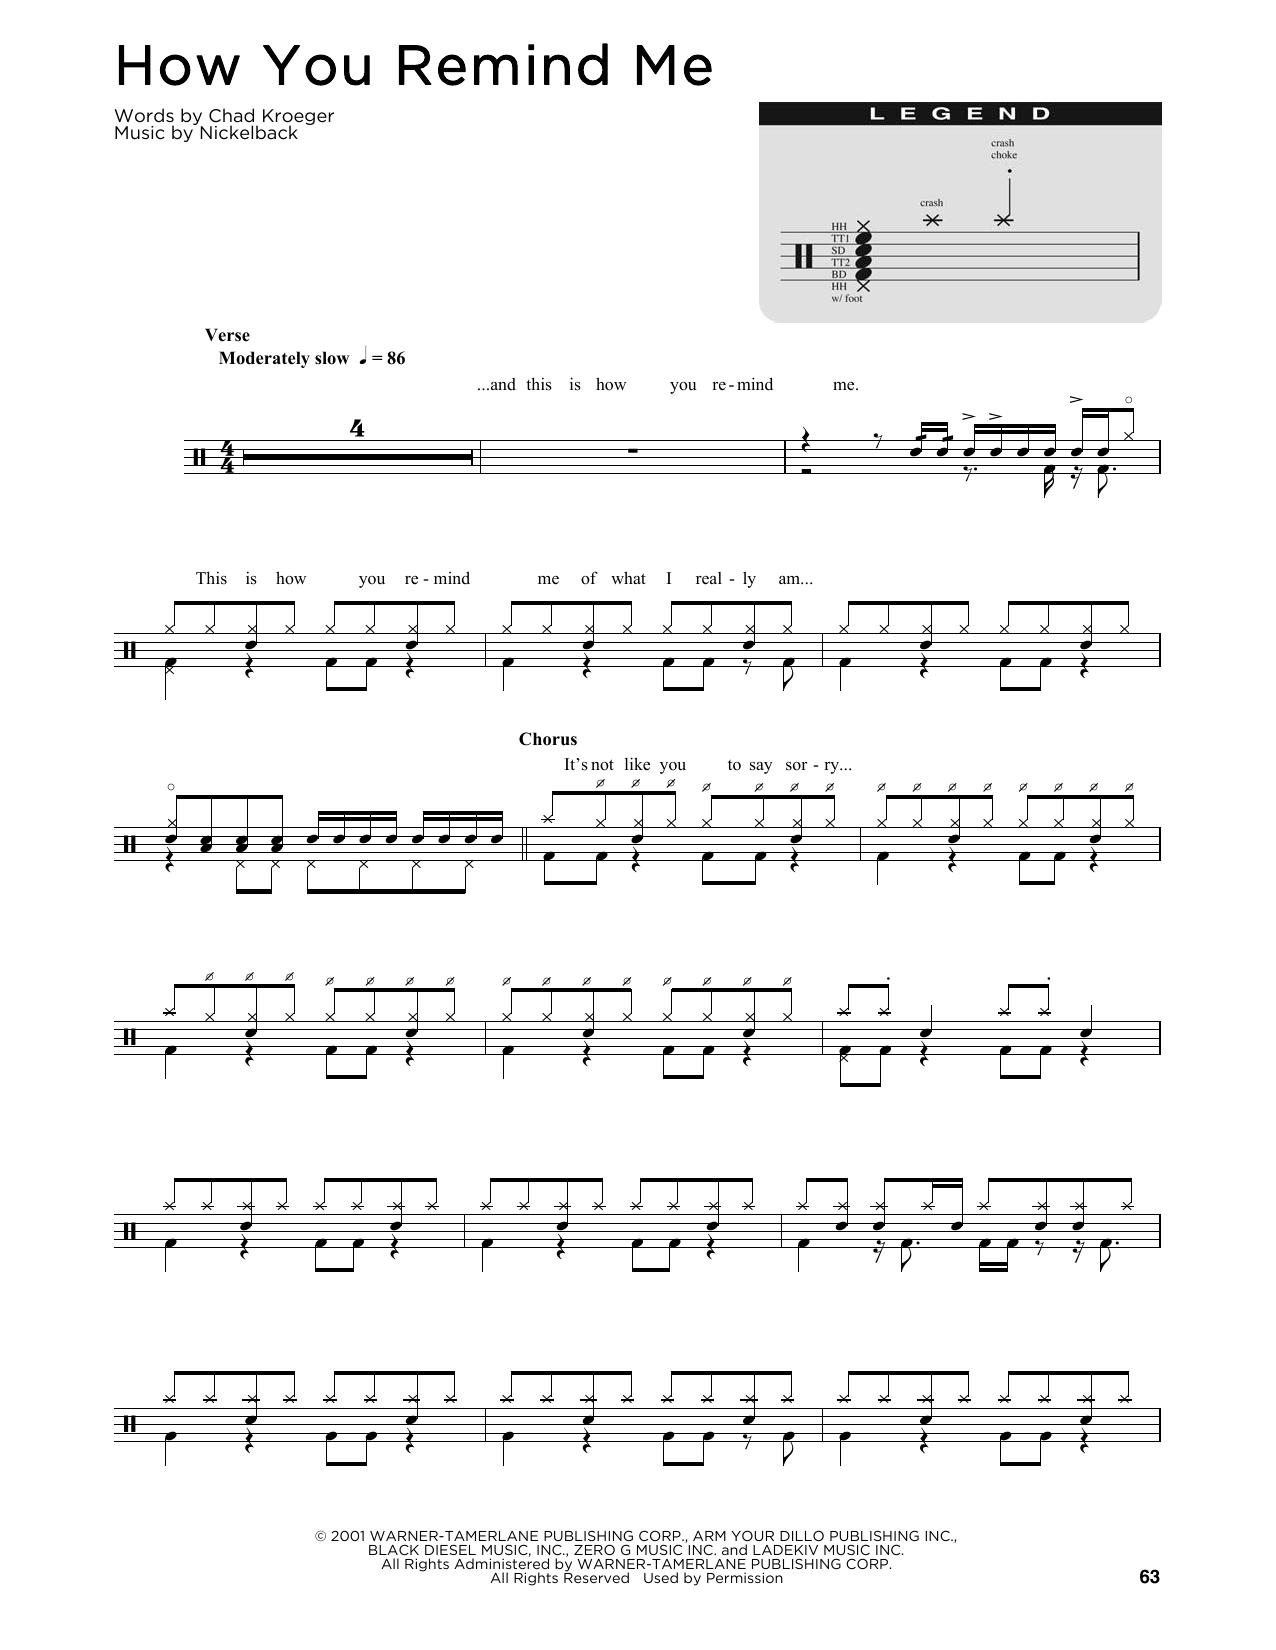 Sheet Music Digital Files To Print Licensed Nickelback Digital